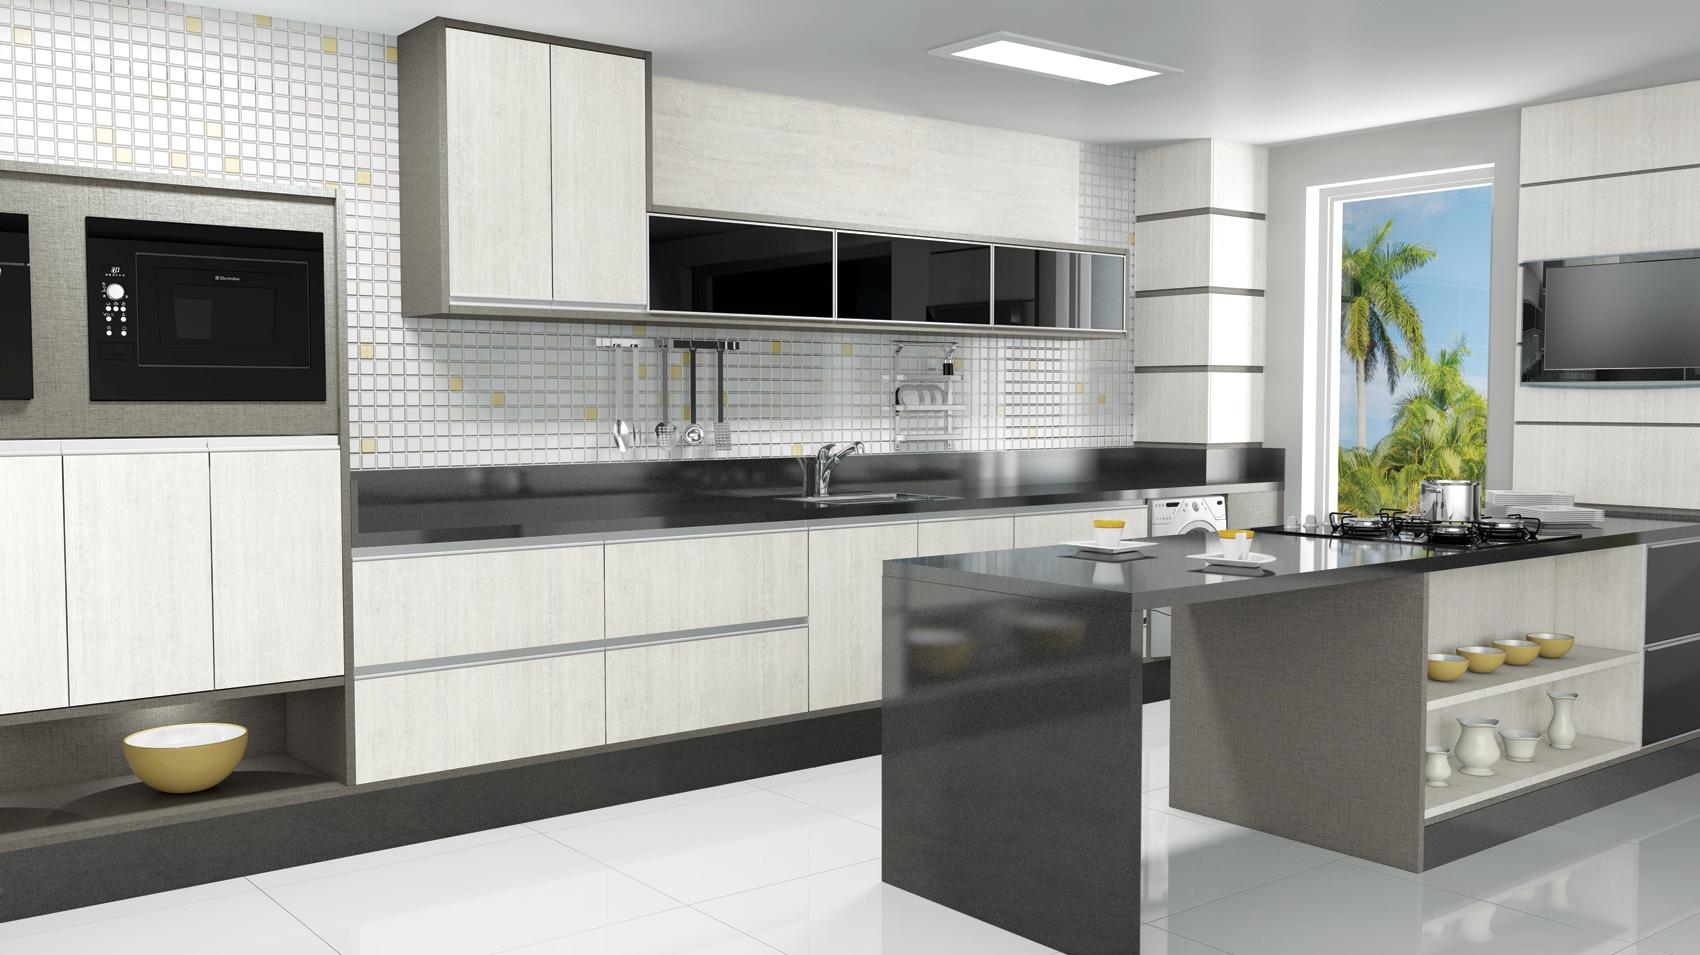 Vitta Ambientes Planejados » COZINHA # Bancada Cozinha Inox Sob Medida